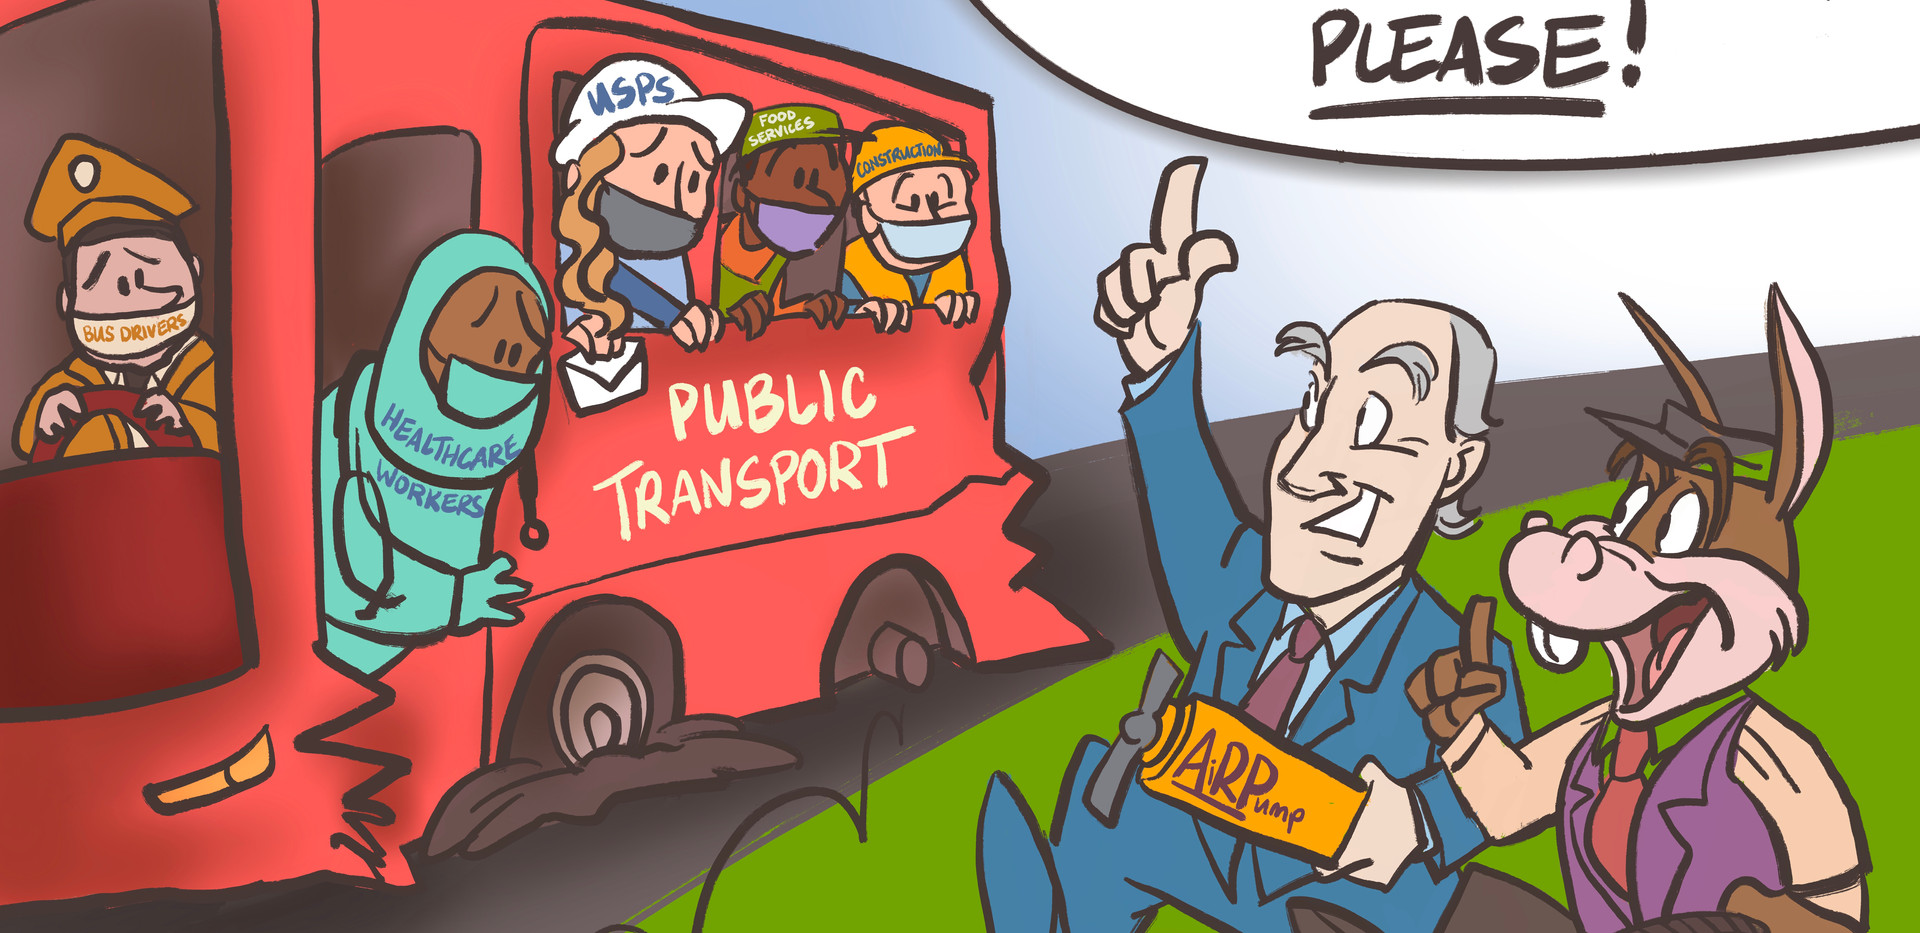 PublicTransport.JPG